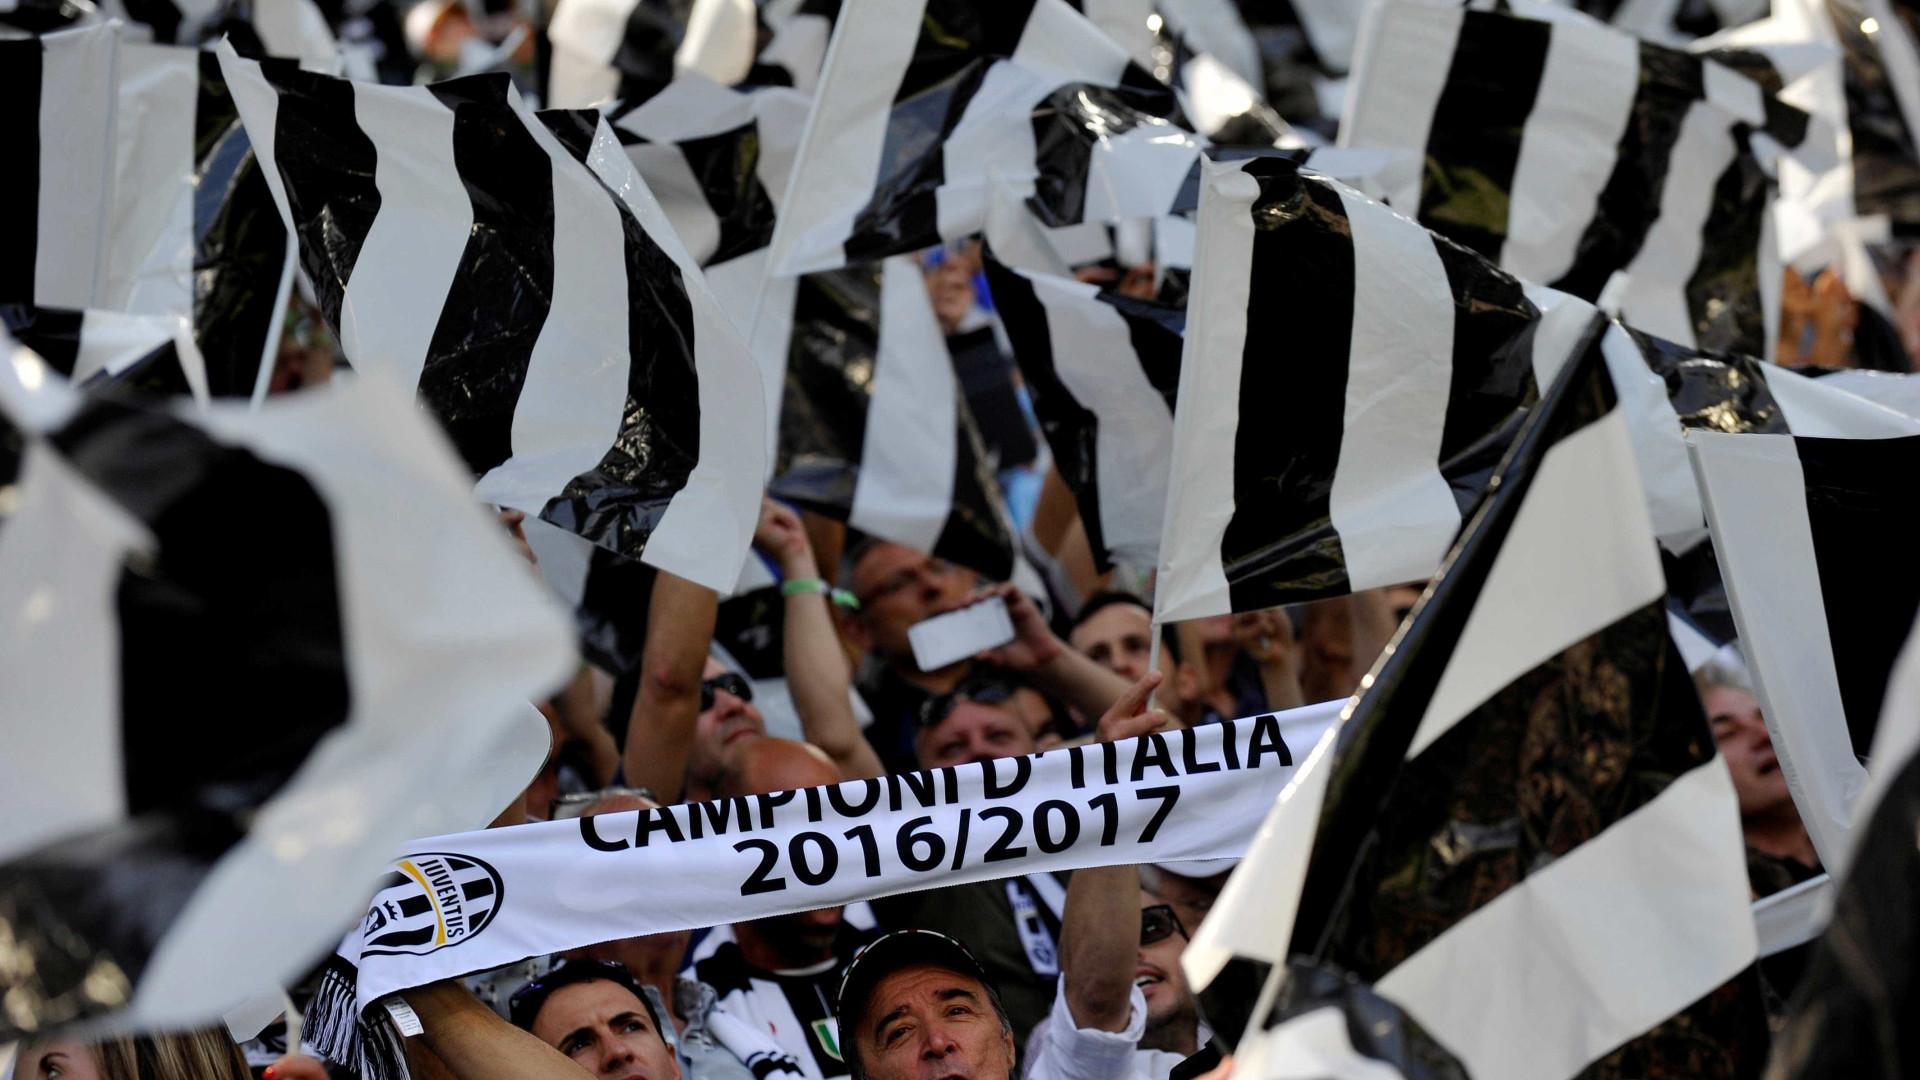 Real Madrid tenta a 12.ª 'champions', Juventus a terceira